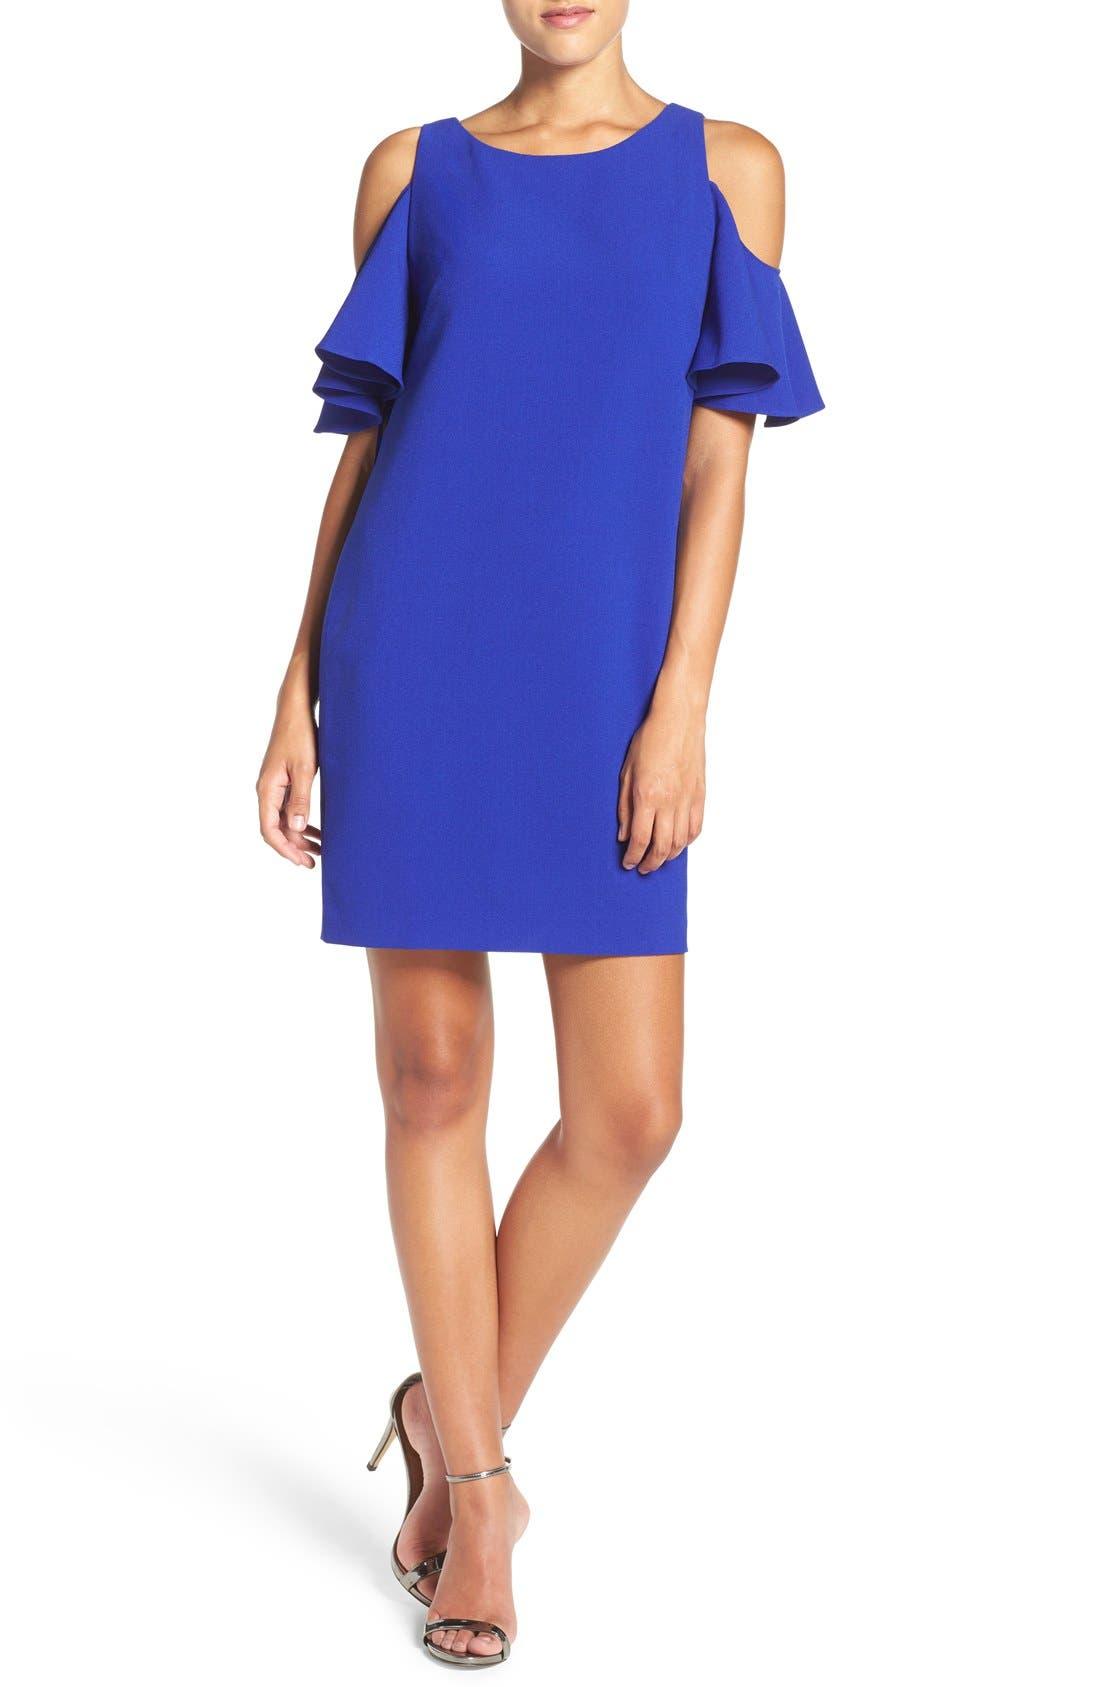 Main Image - Chelsea28 'Peek-A-Boo' Cold Shoulder Shift Dress